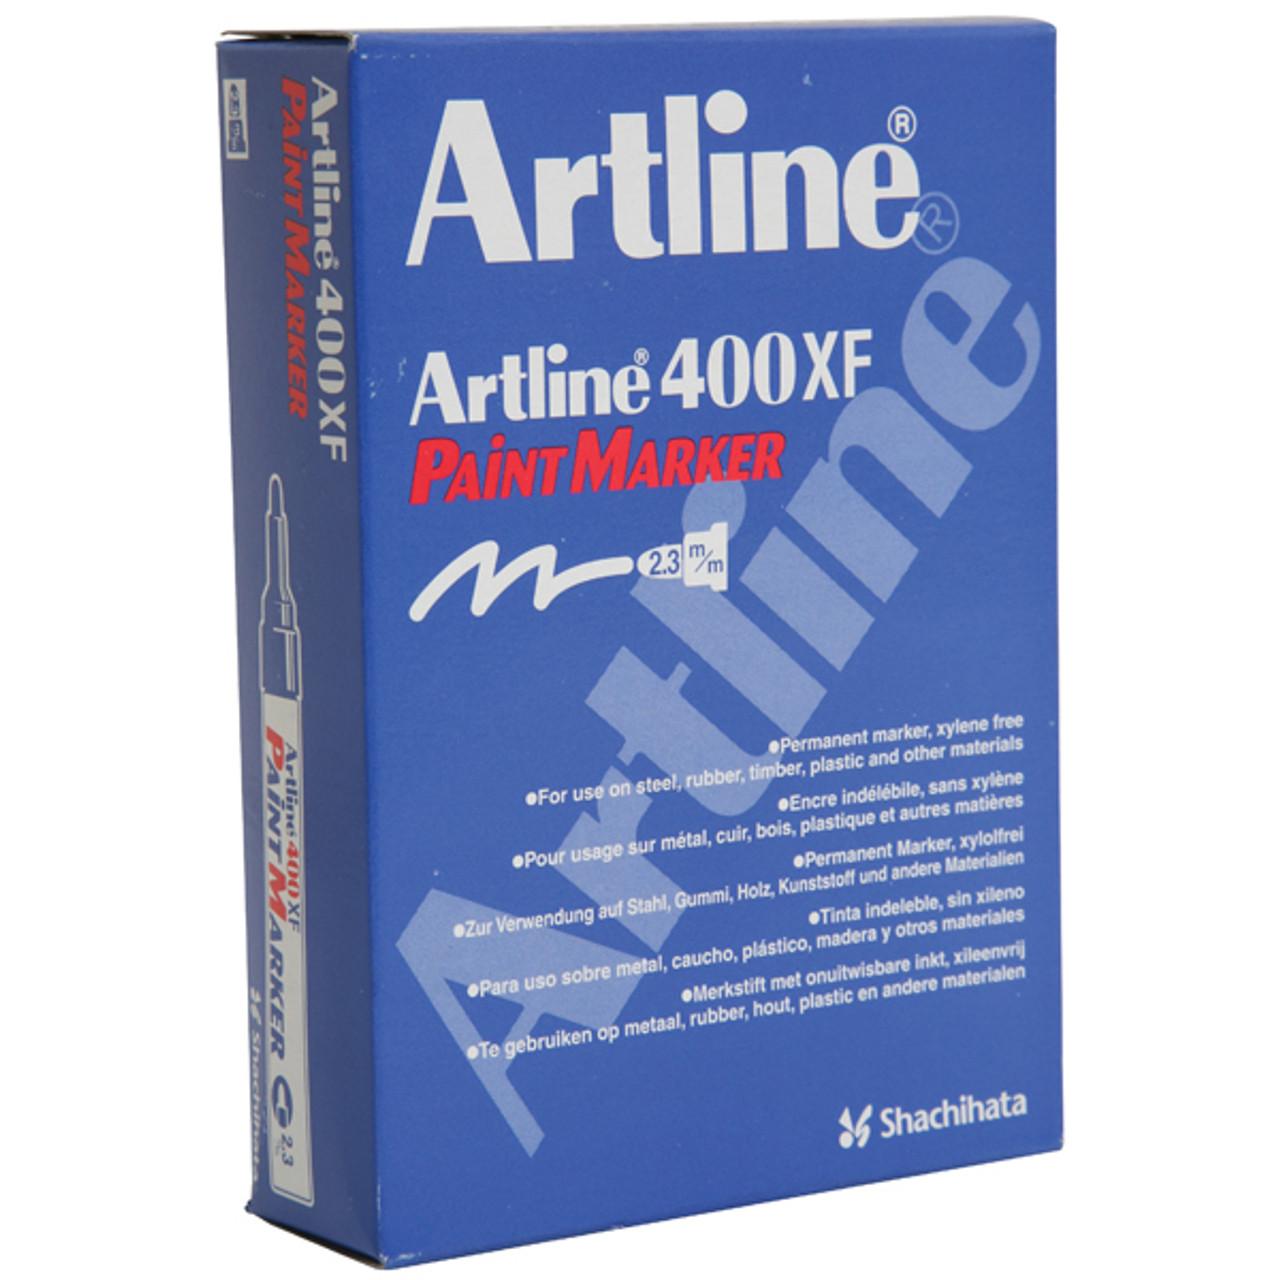 Artline Permanent Marker 400XF Med Bullet Nib Multiple Colors